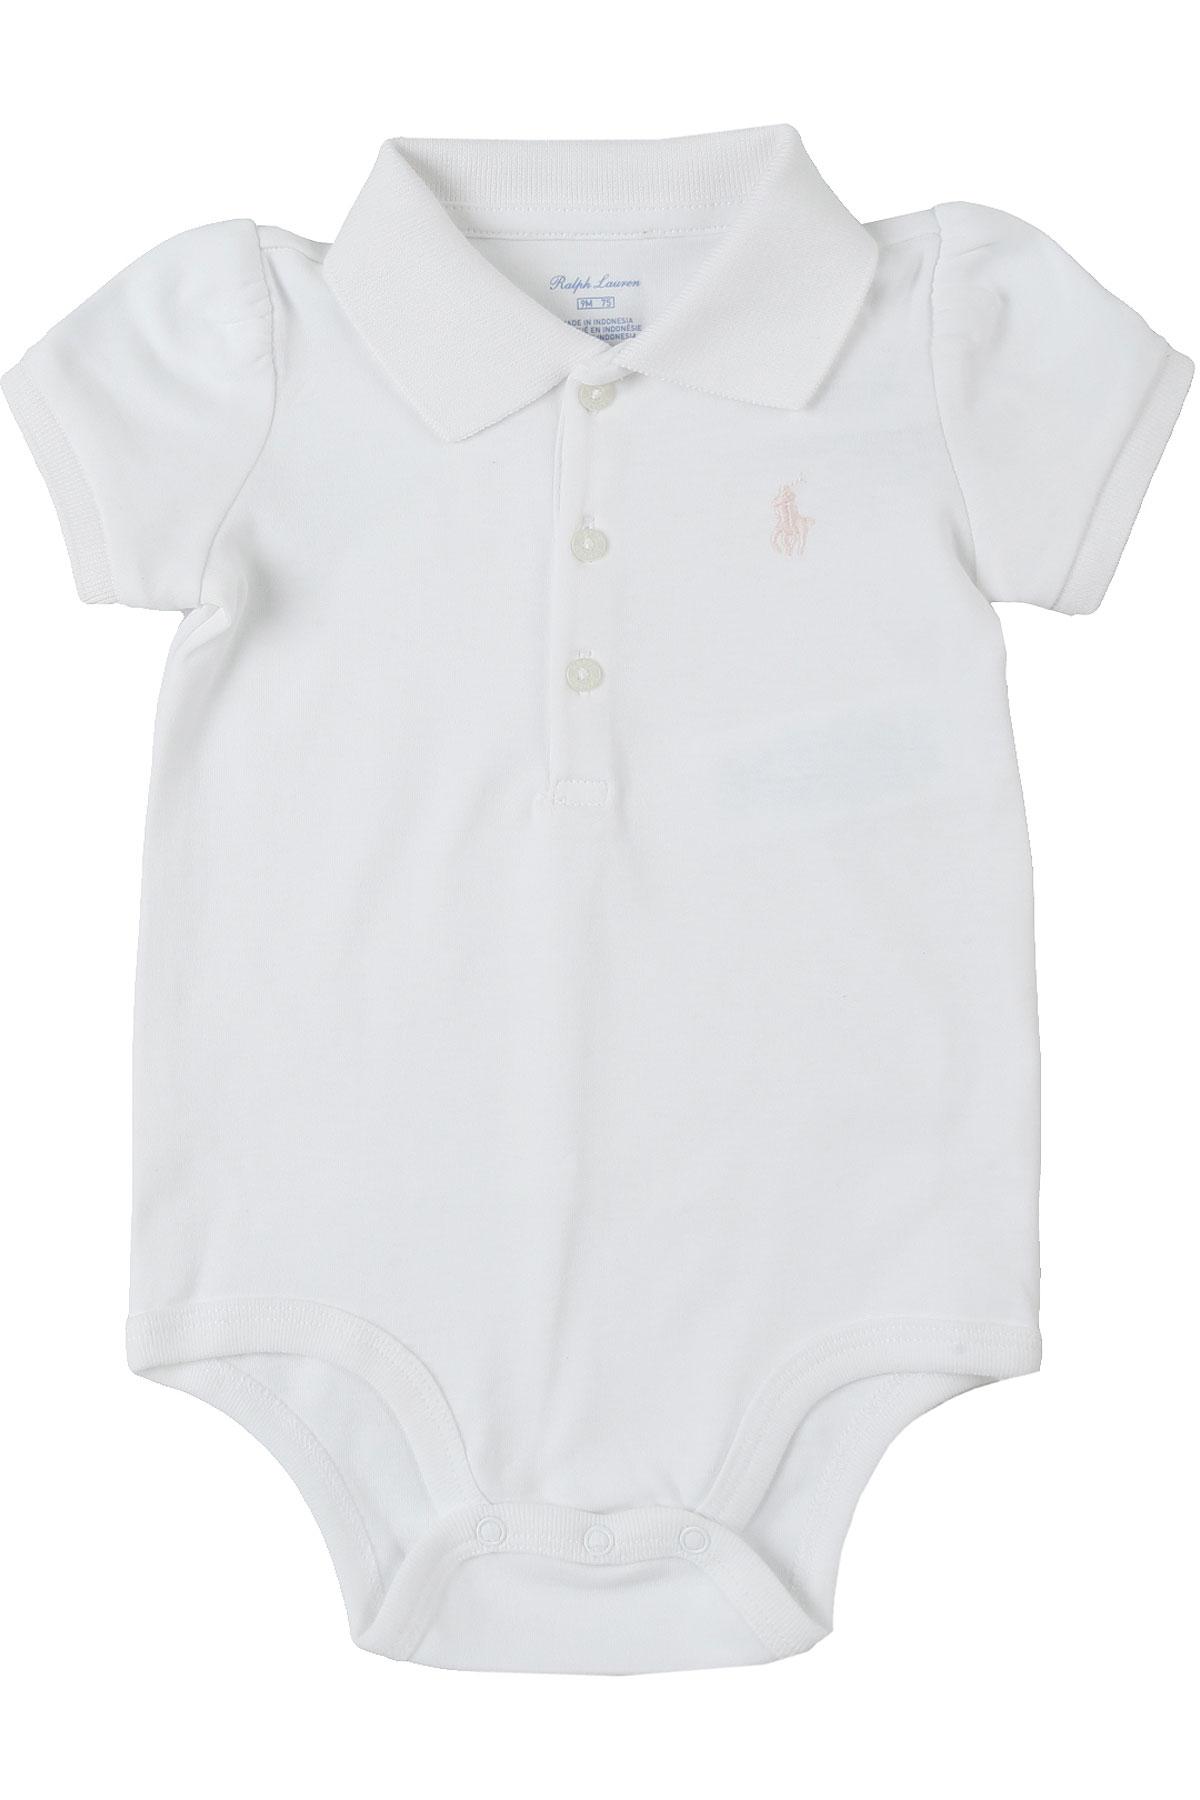 Ralph Lauren Baby Bodysuits & Onesies for Girls On Sale, White, Cotton, 2019, 3M 6M 9M